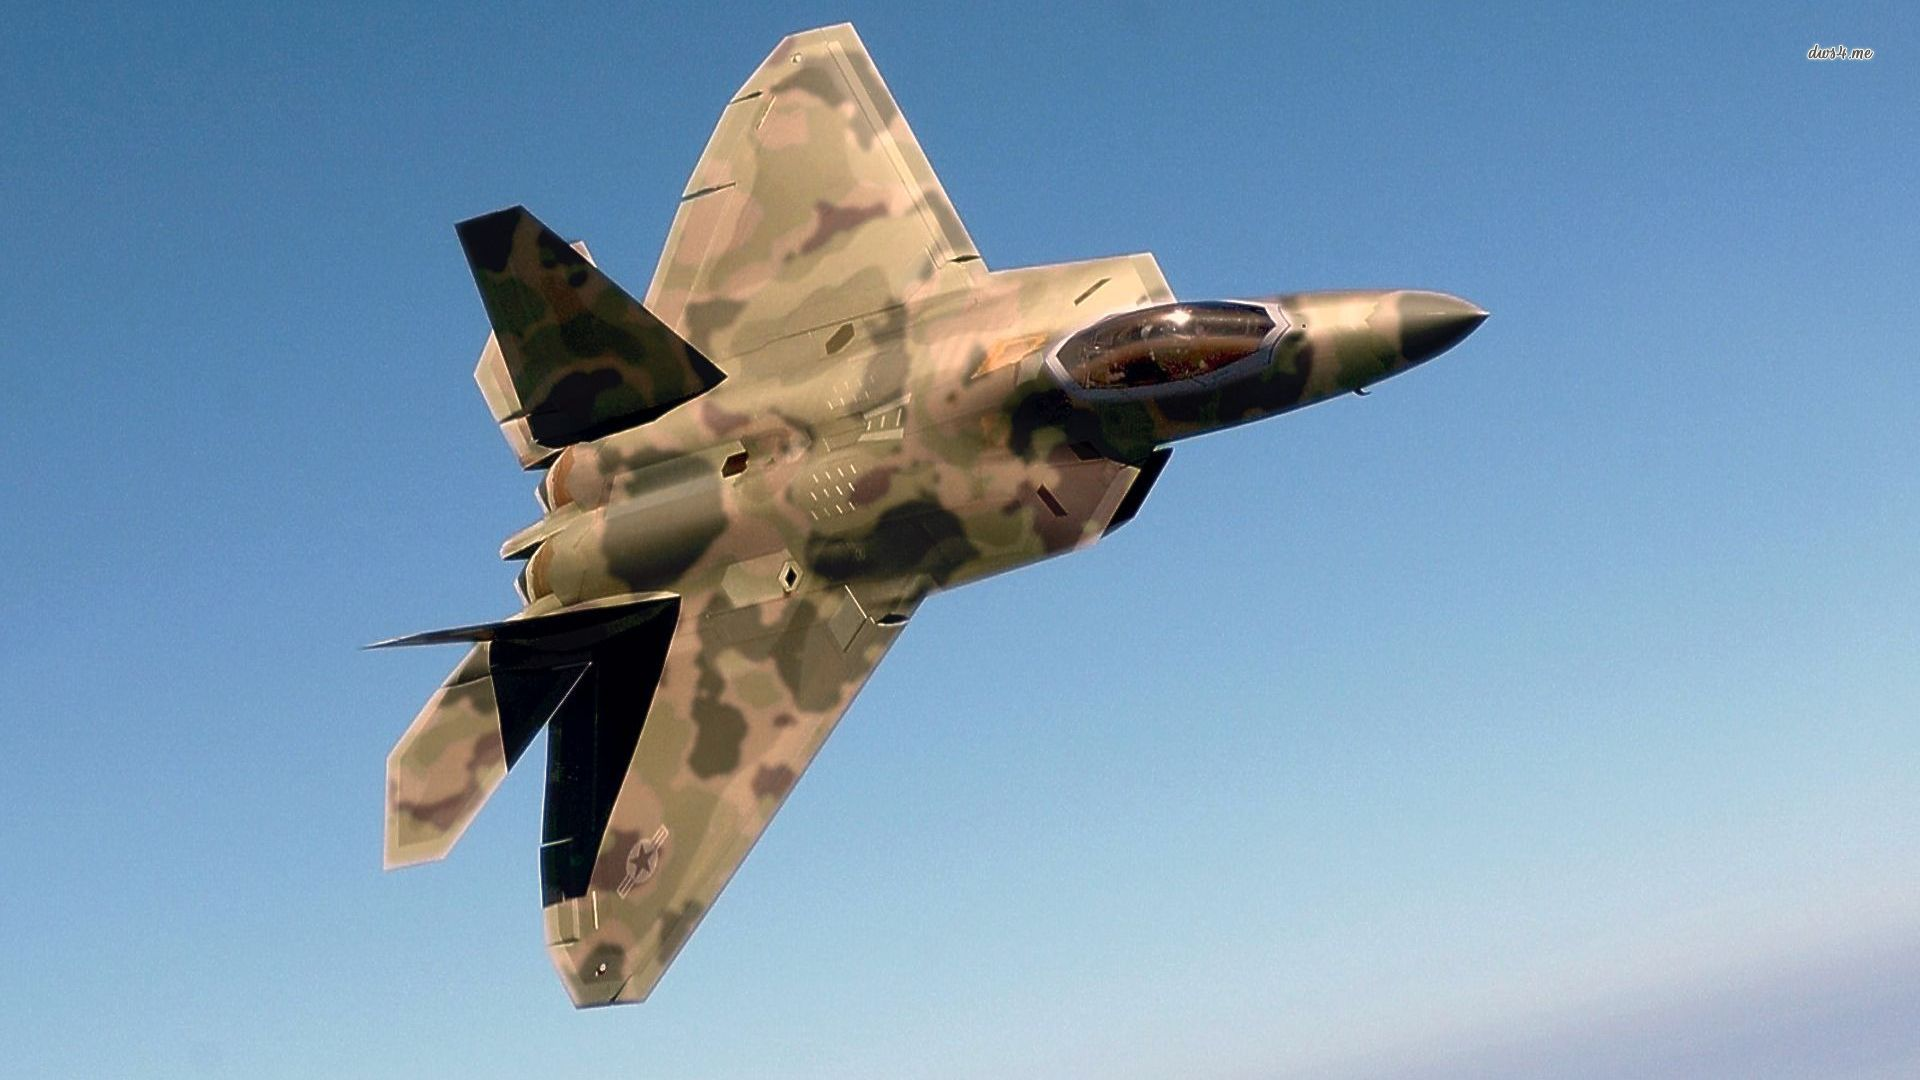 Lockheed Martin F 22 Raptor wallpaper   Aircraft wallpapers   5631 1920x1080